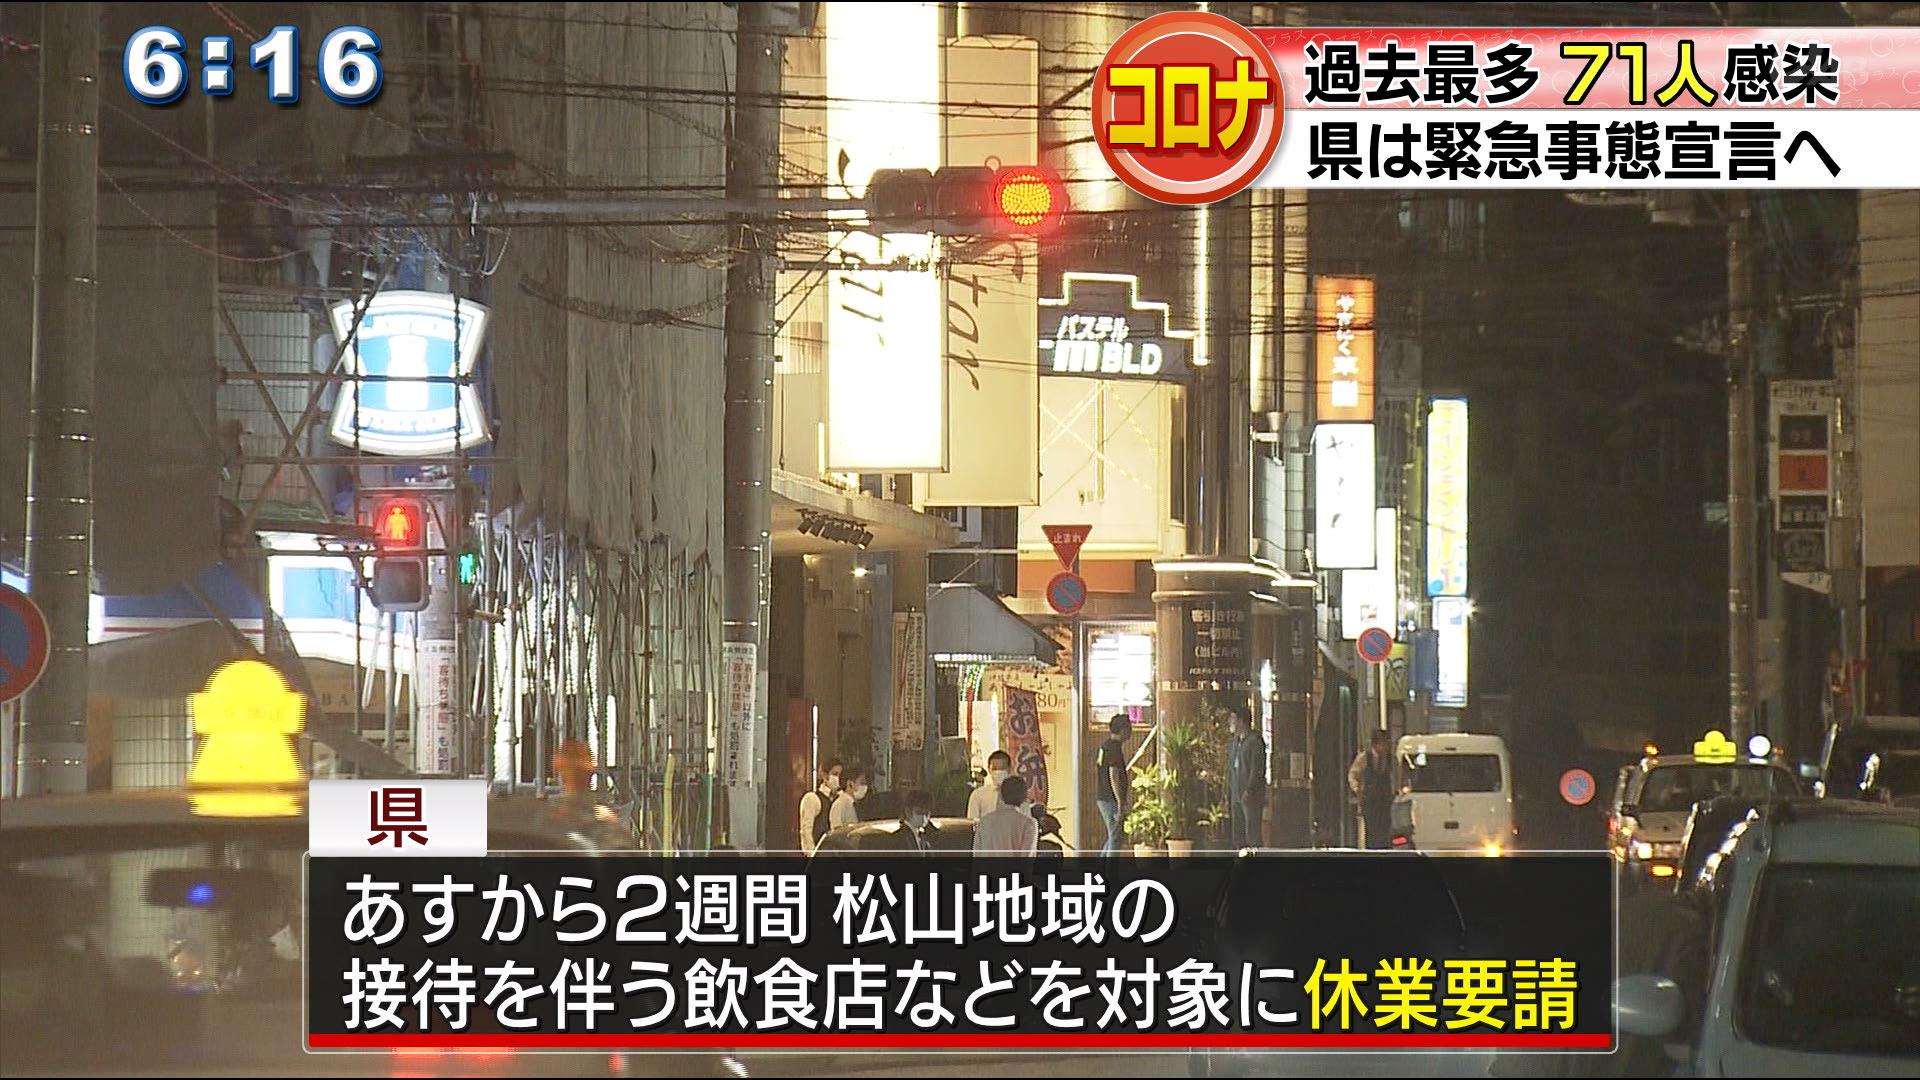 過去最多71人 県は緊急事態宣言へ